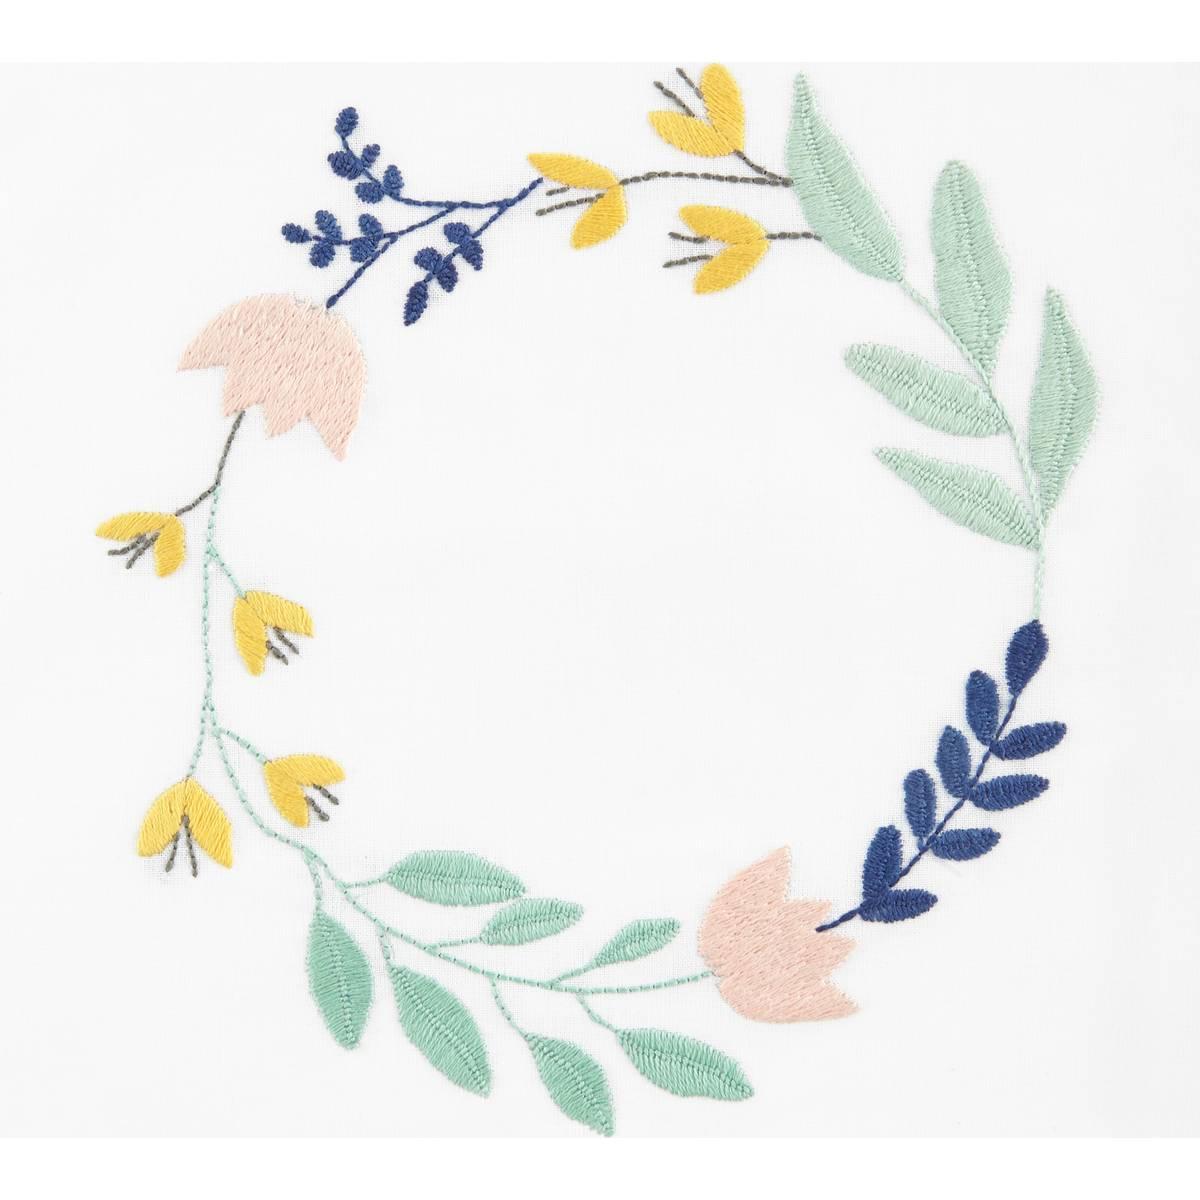 Free Flower Embroidery Patterns Cross Stitch Patterns Embroidery Patterns Hobcraft